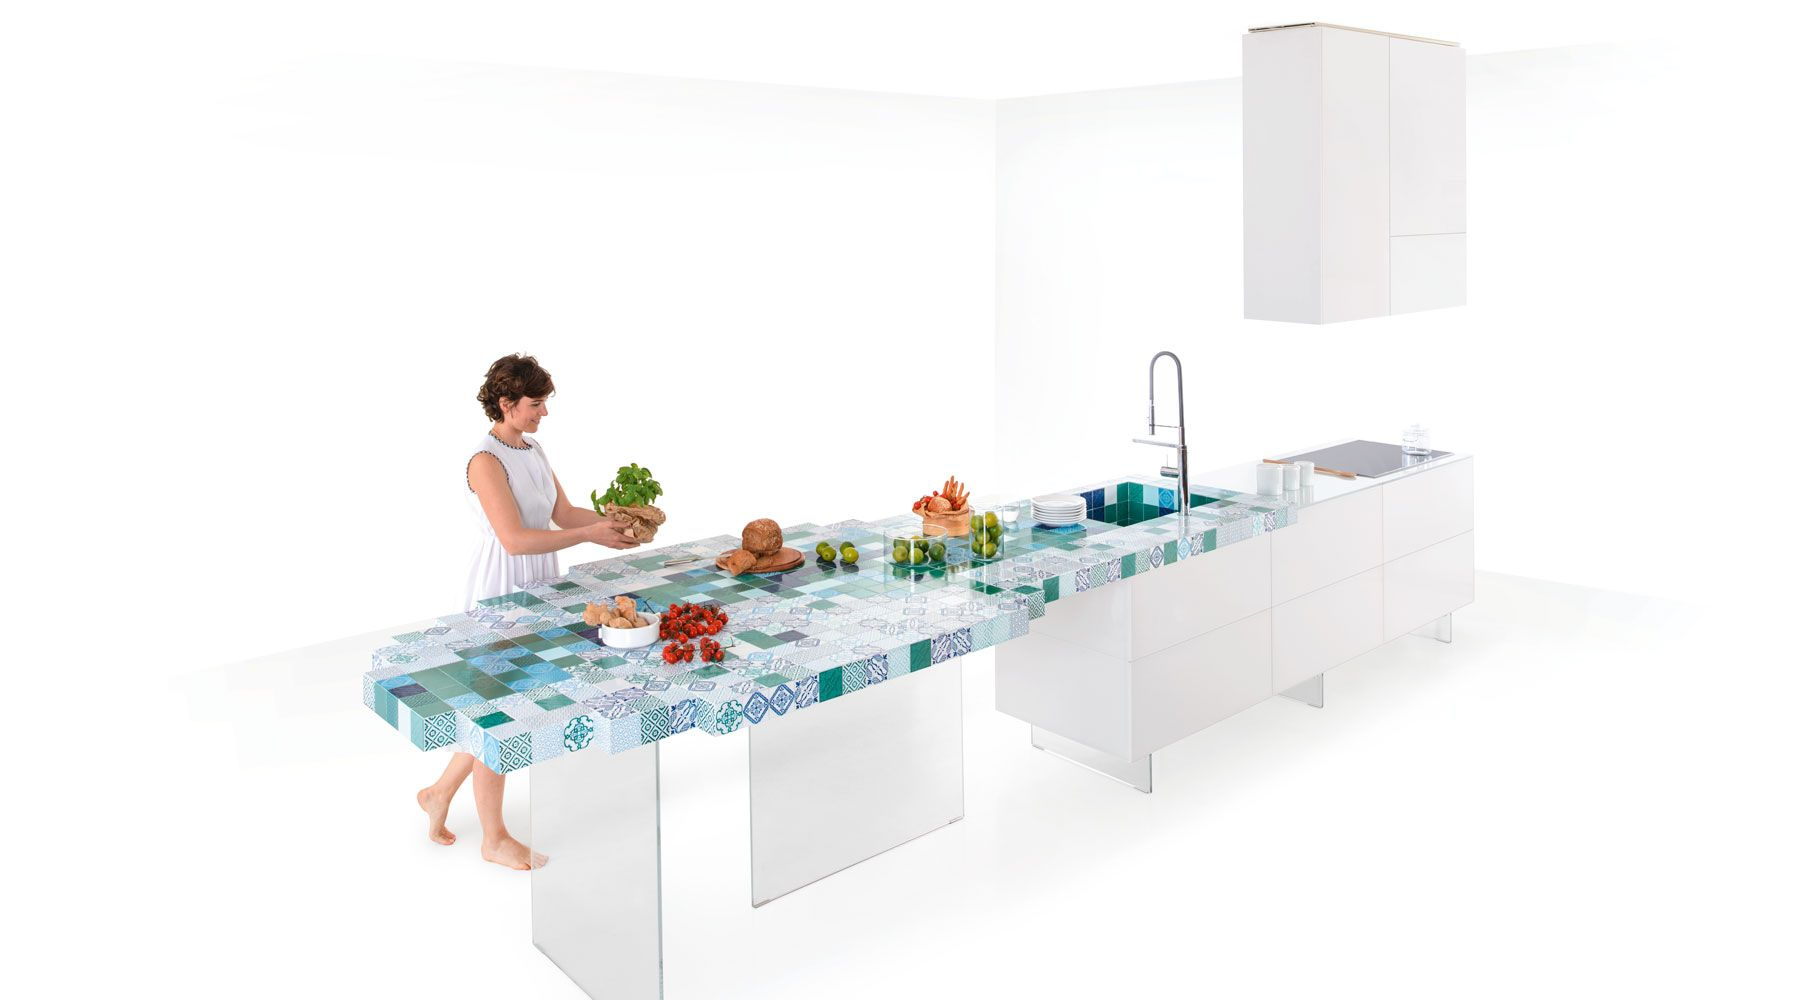 Cucina e madeterraneo work surface